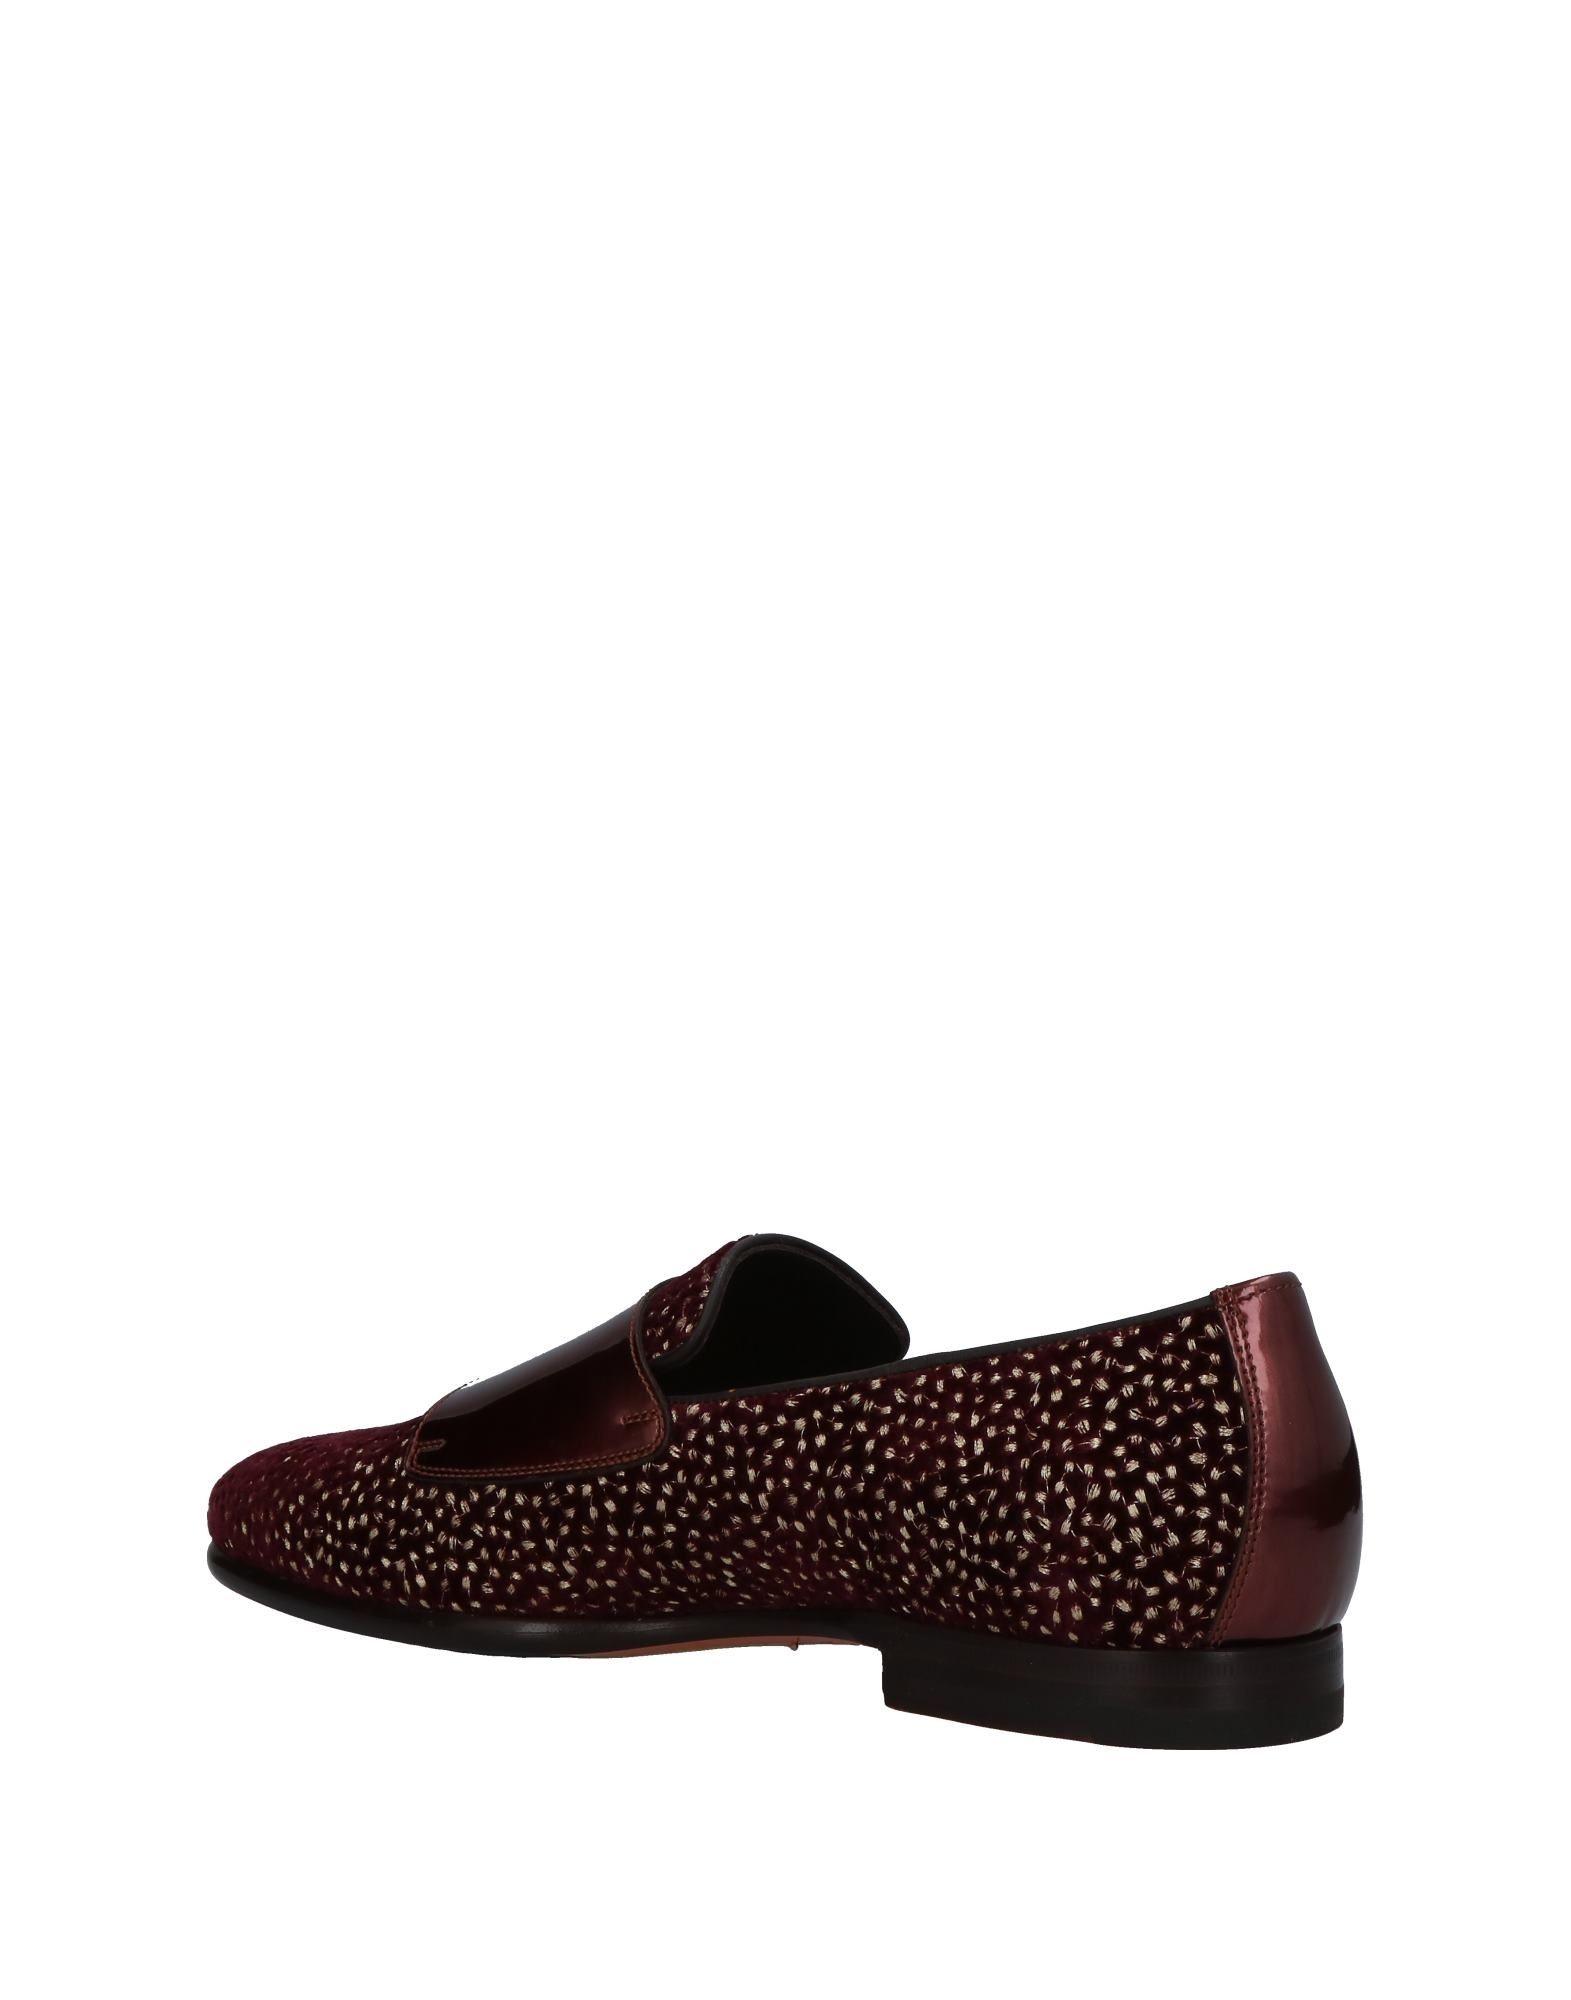 Santoni 11409882DX Mokassins Herren  11409882DX Santoni Gute Qualität beliebte Schuhe 38967a